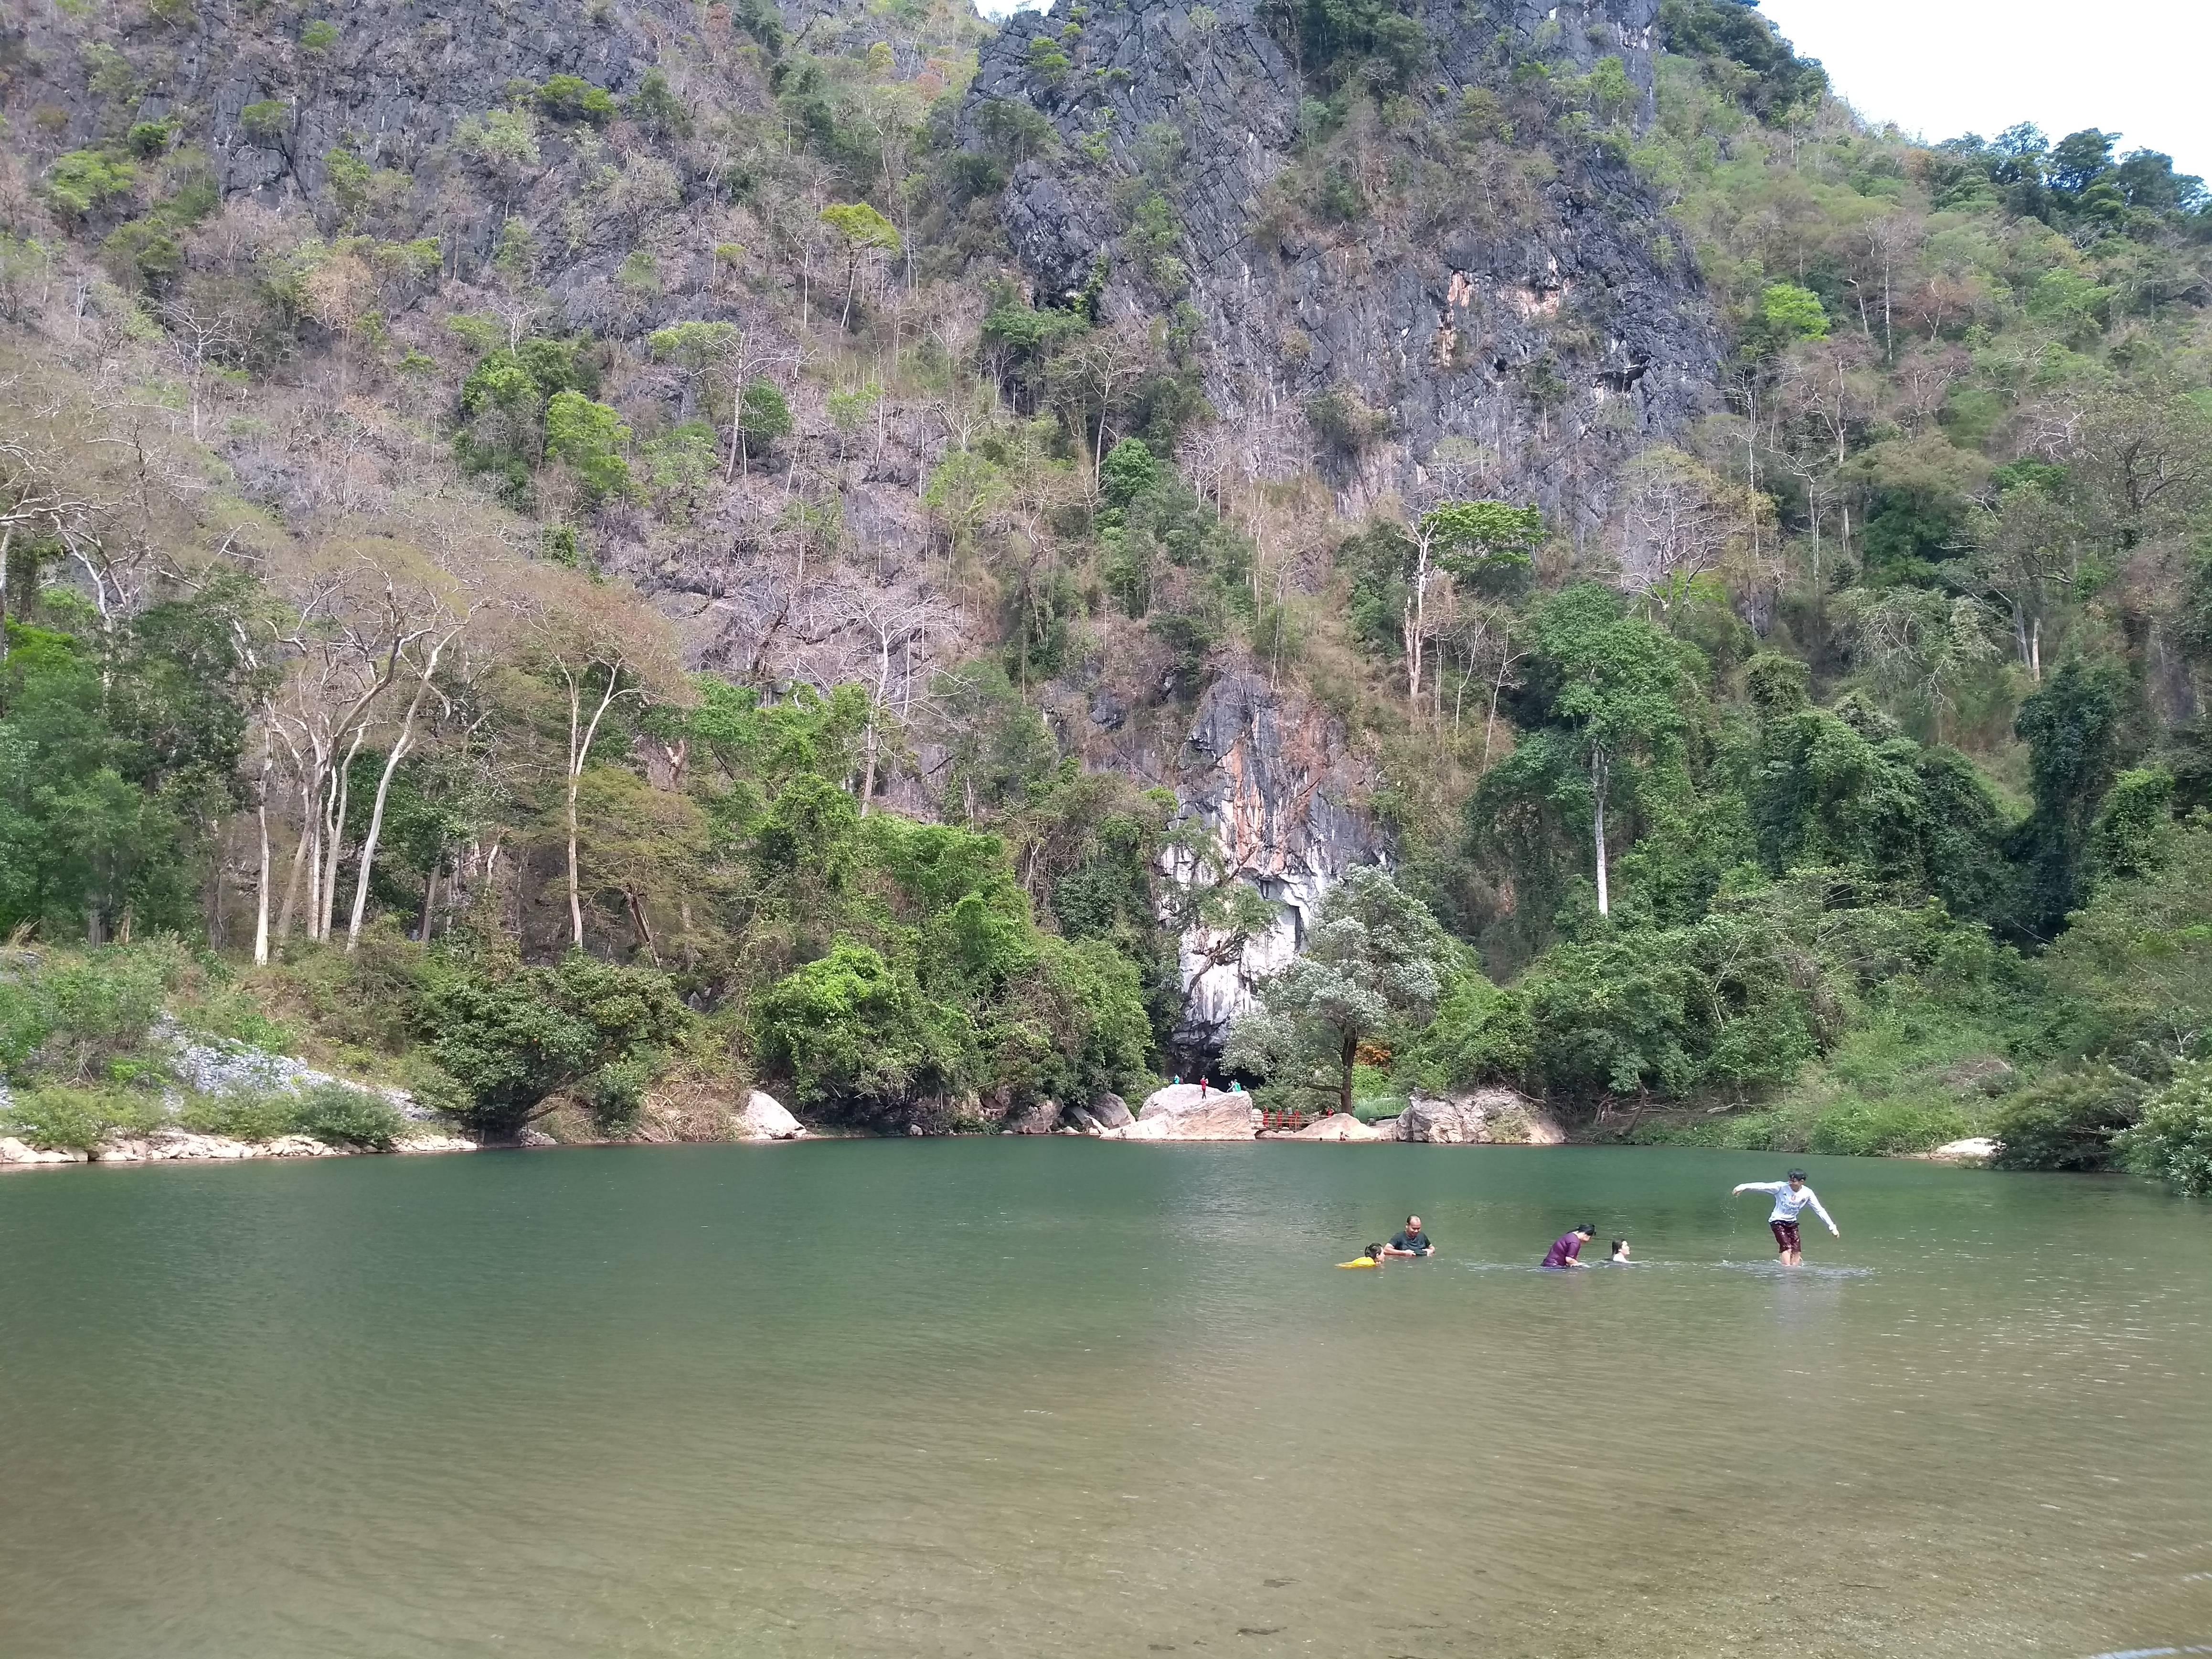 Photo 2: Kong Lor Cave